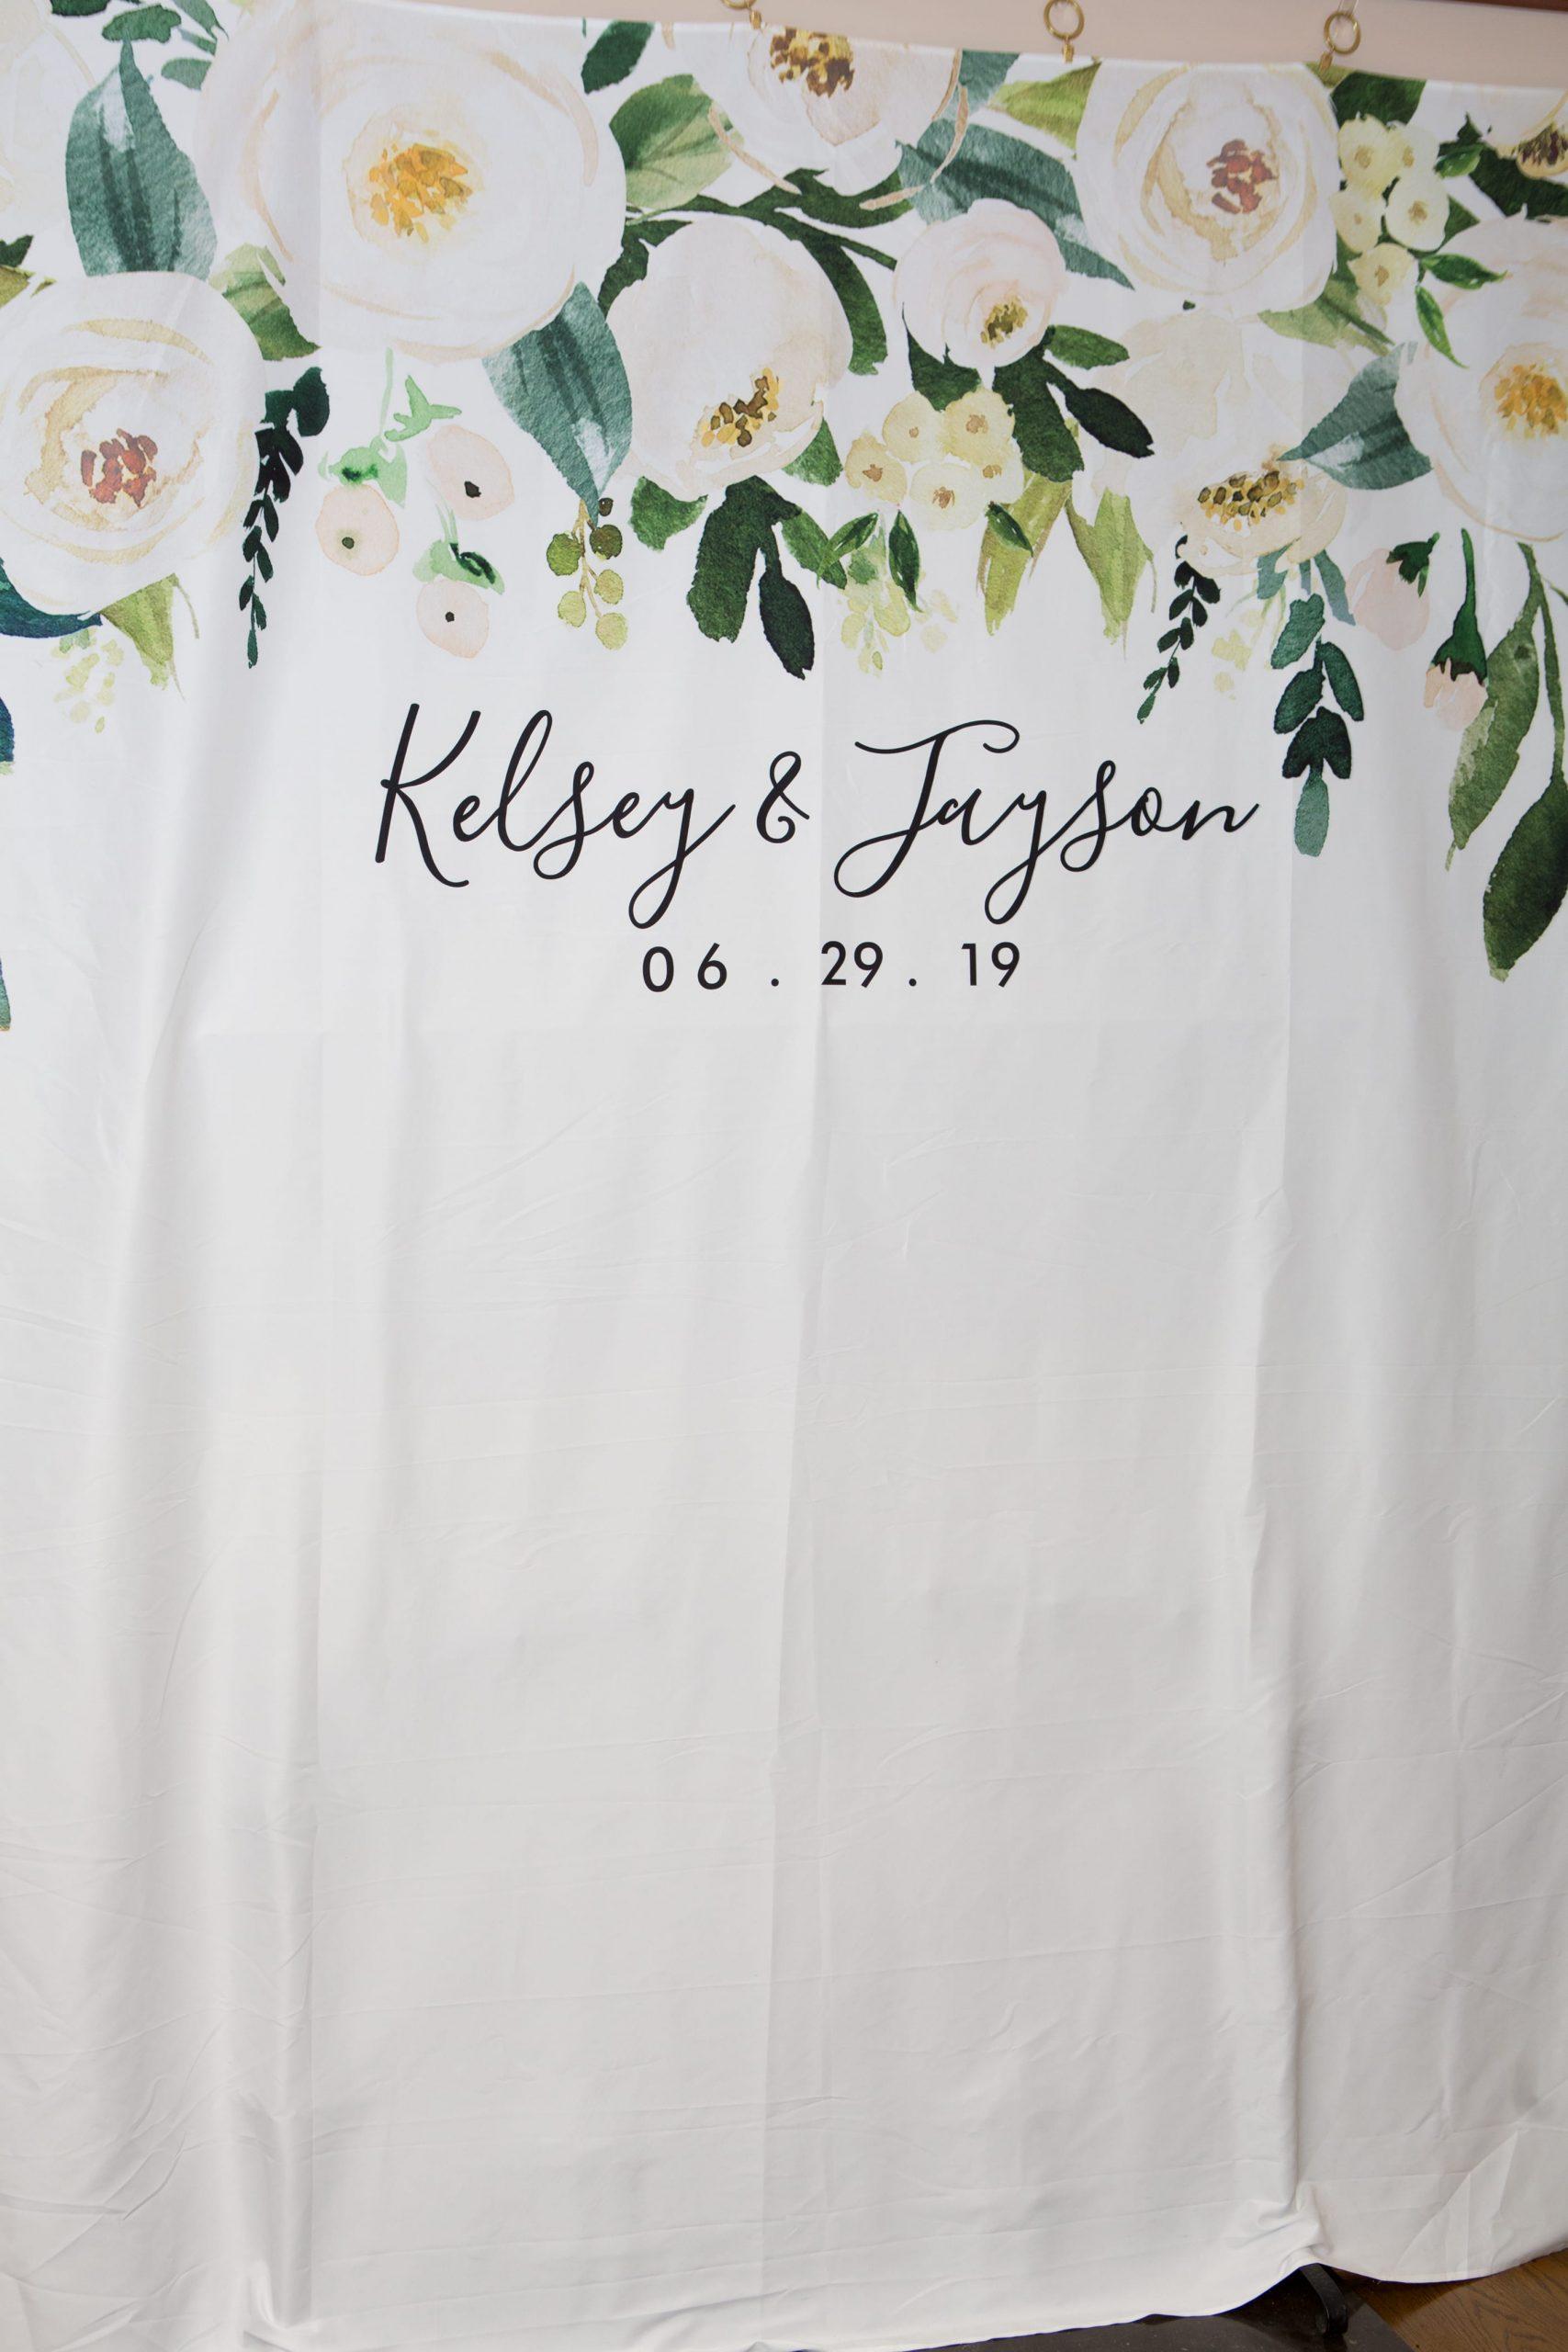 floral photo backdrop at wedding reception